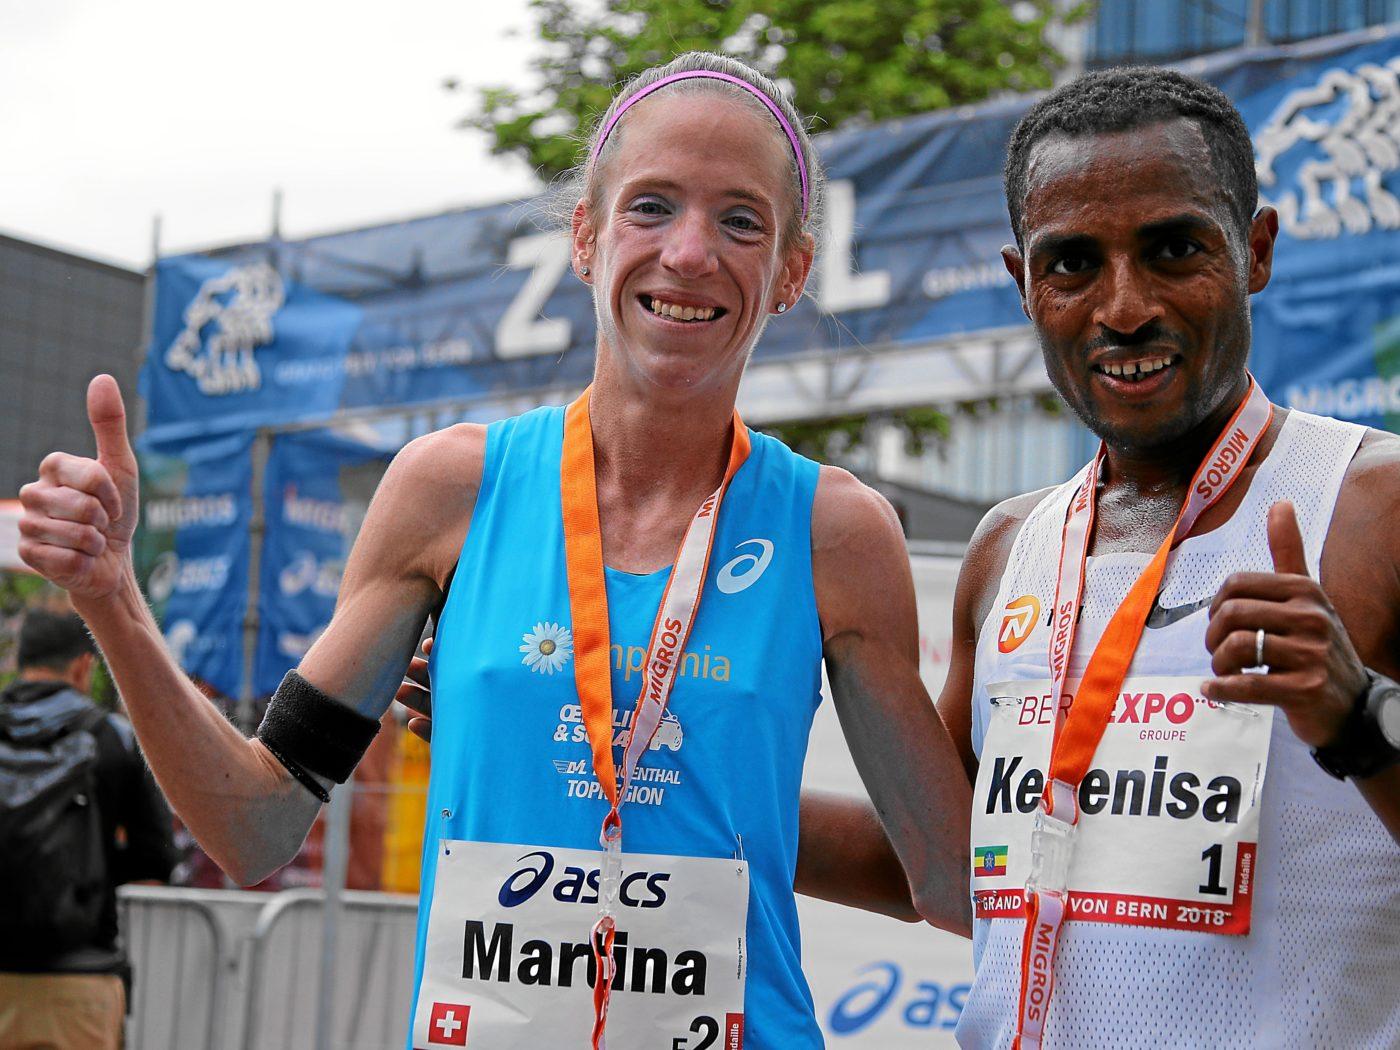 Martina Strähl, Kenenisa Bekele (Photo: swiss-image.ch)